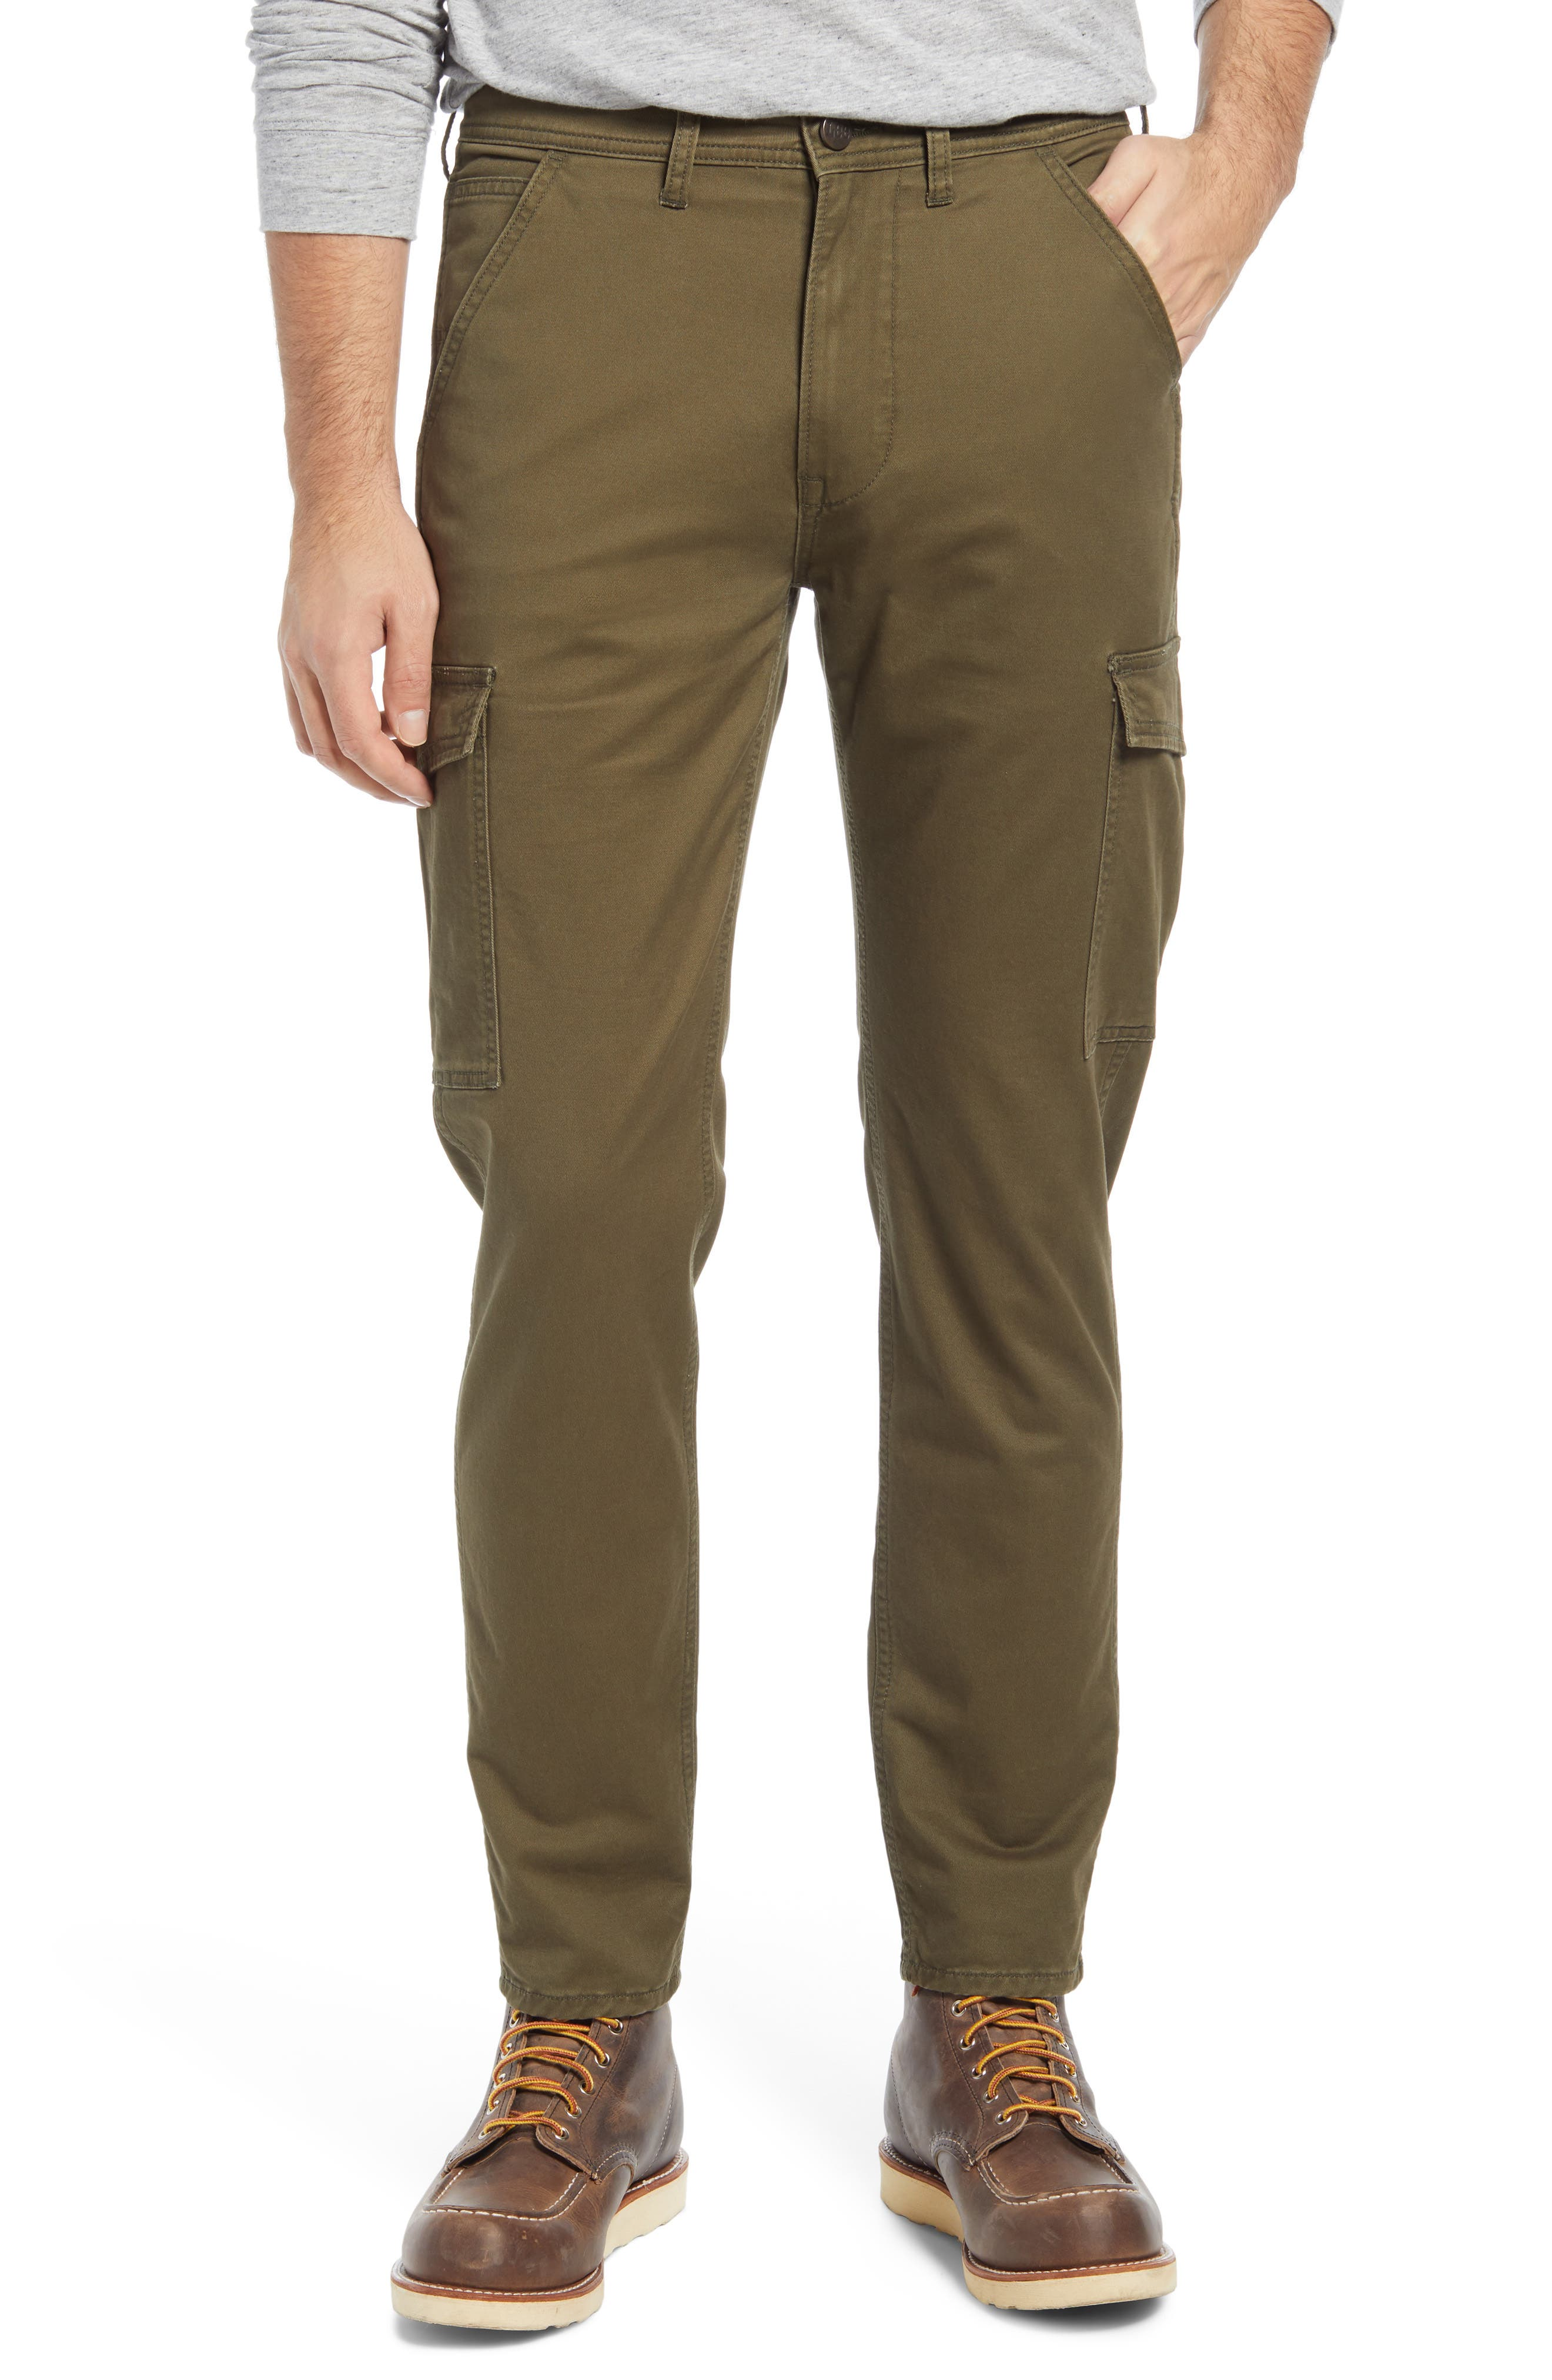 Regular Tapered Leg Twill Cargo Pants